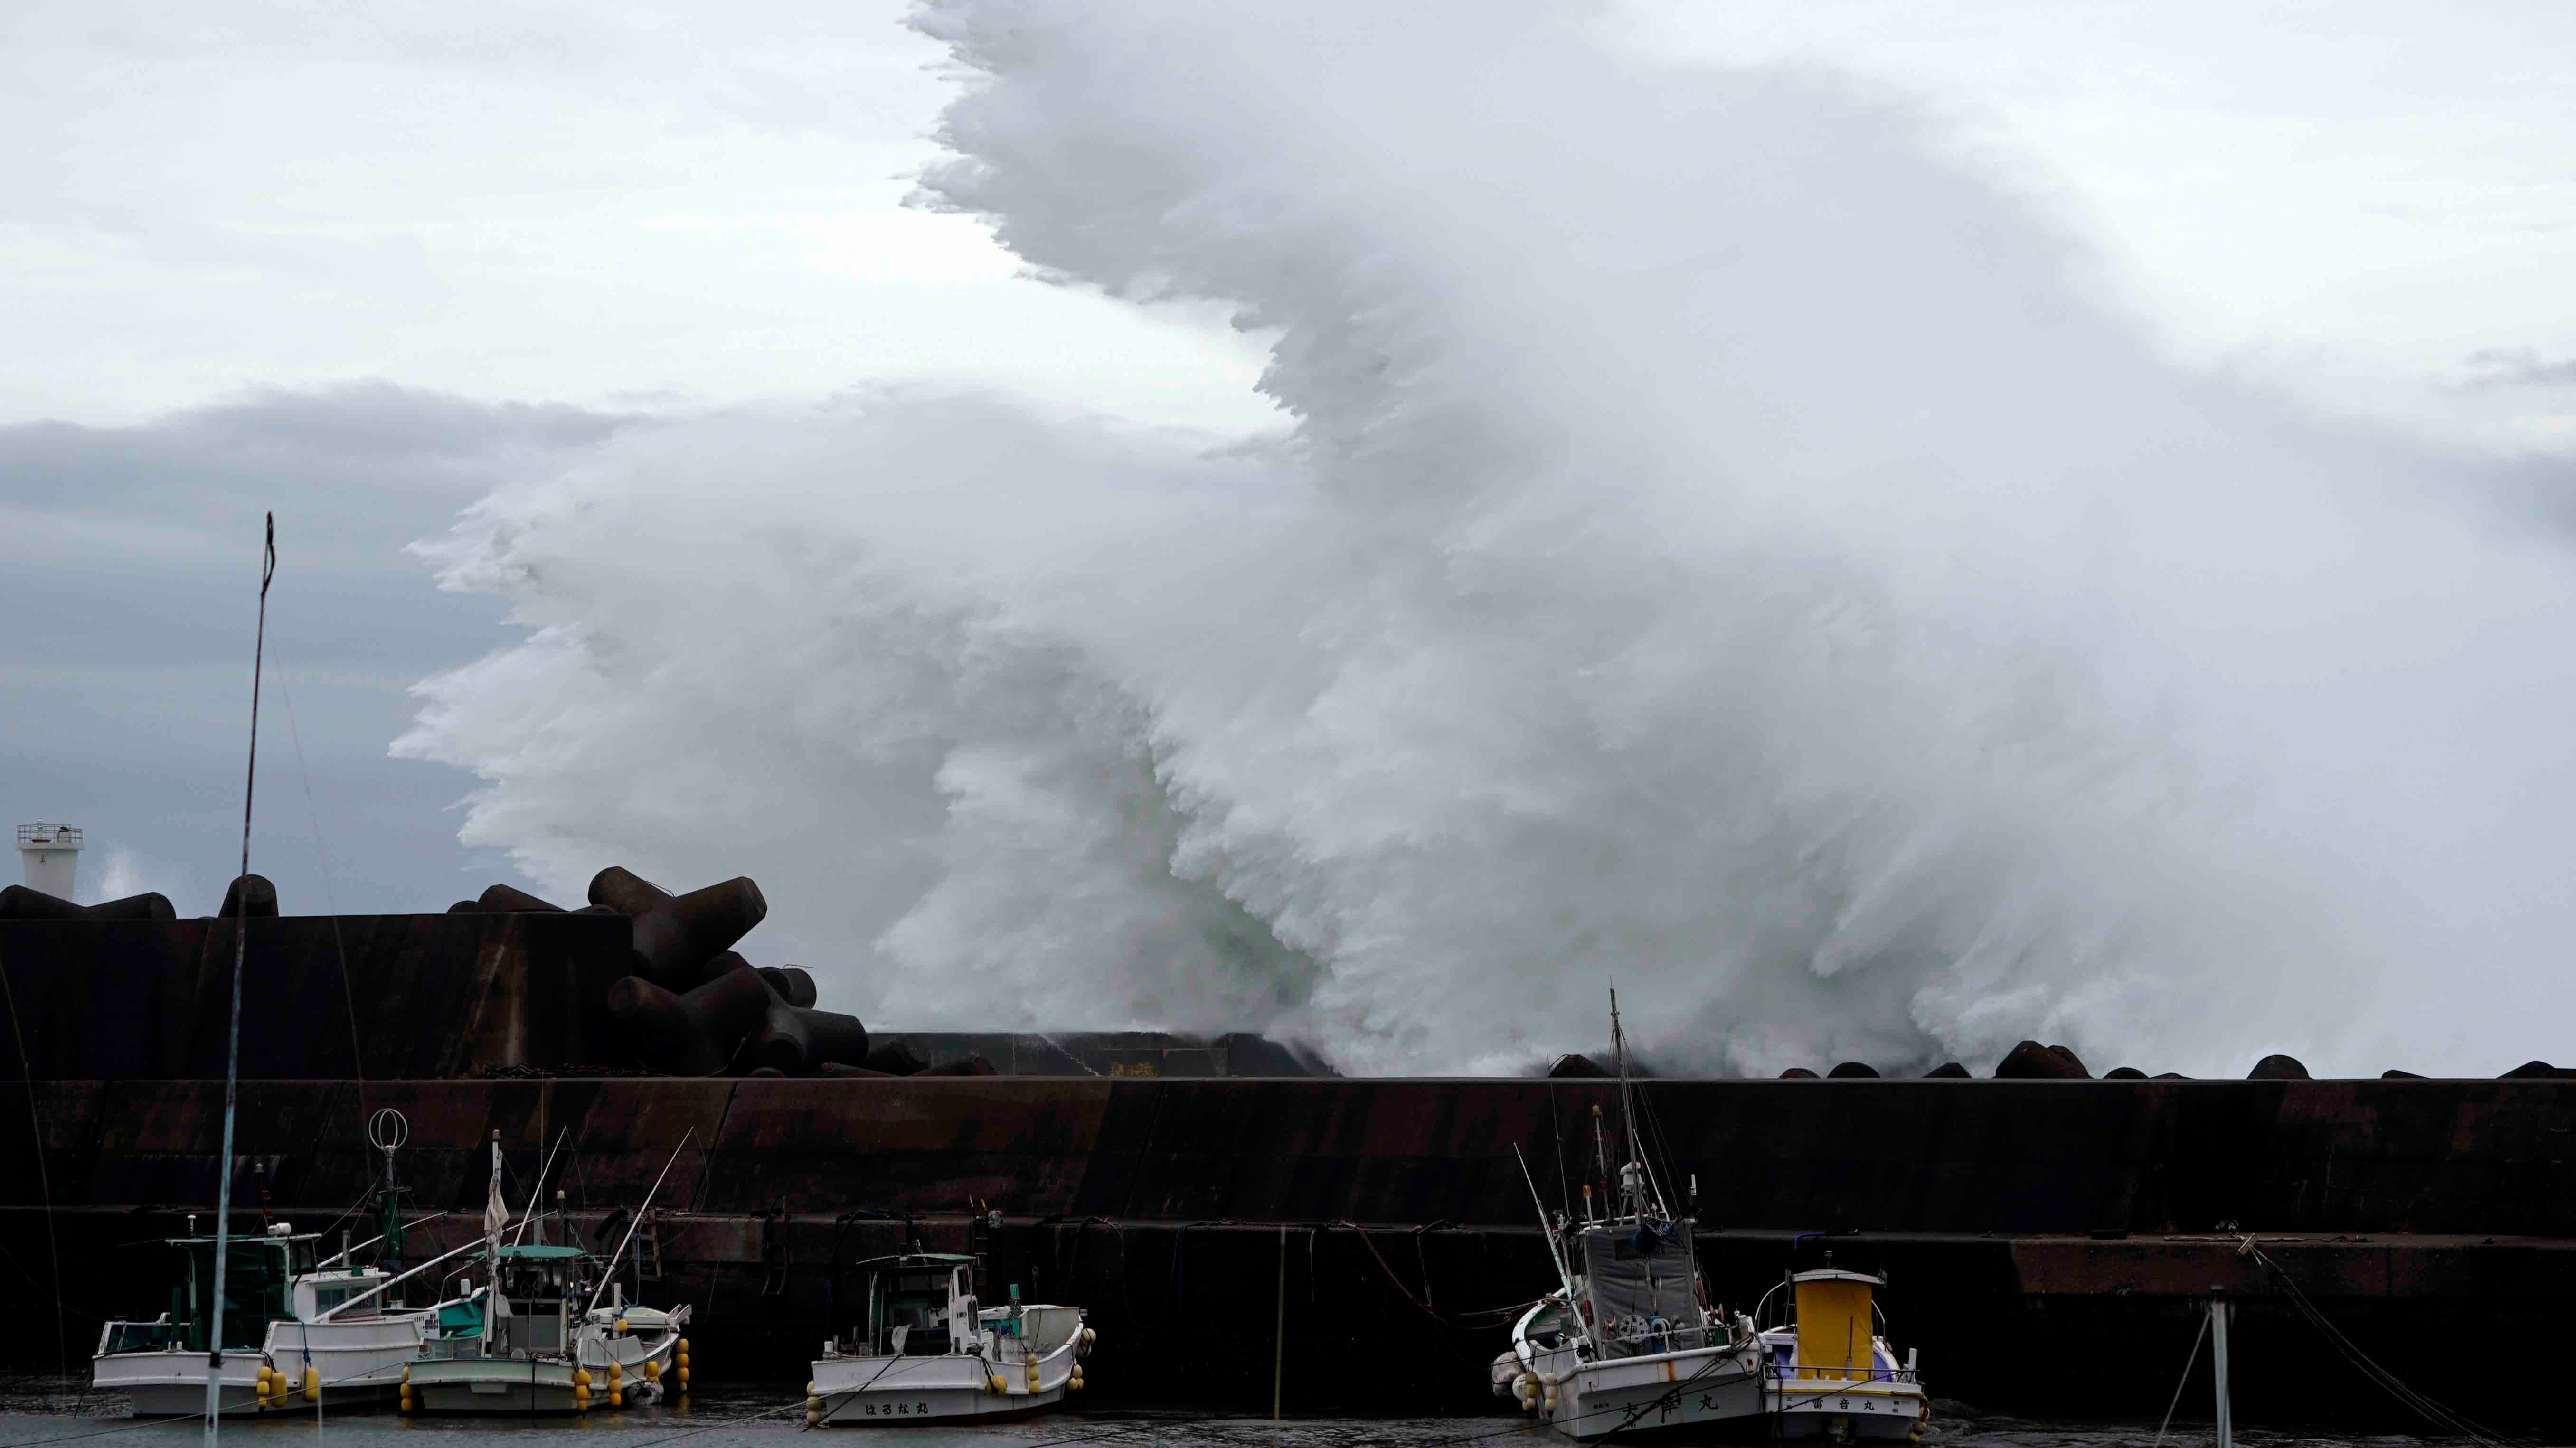 Japan Prepares for Typhoon Hagibis; Flights Canceled, Train Service Shut Down